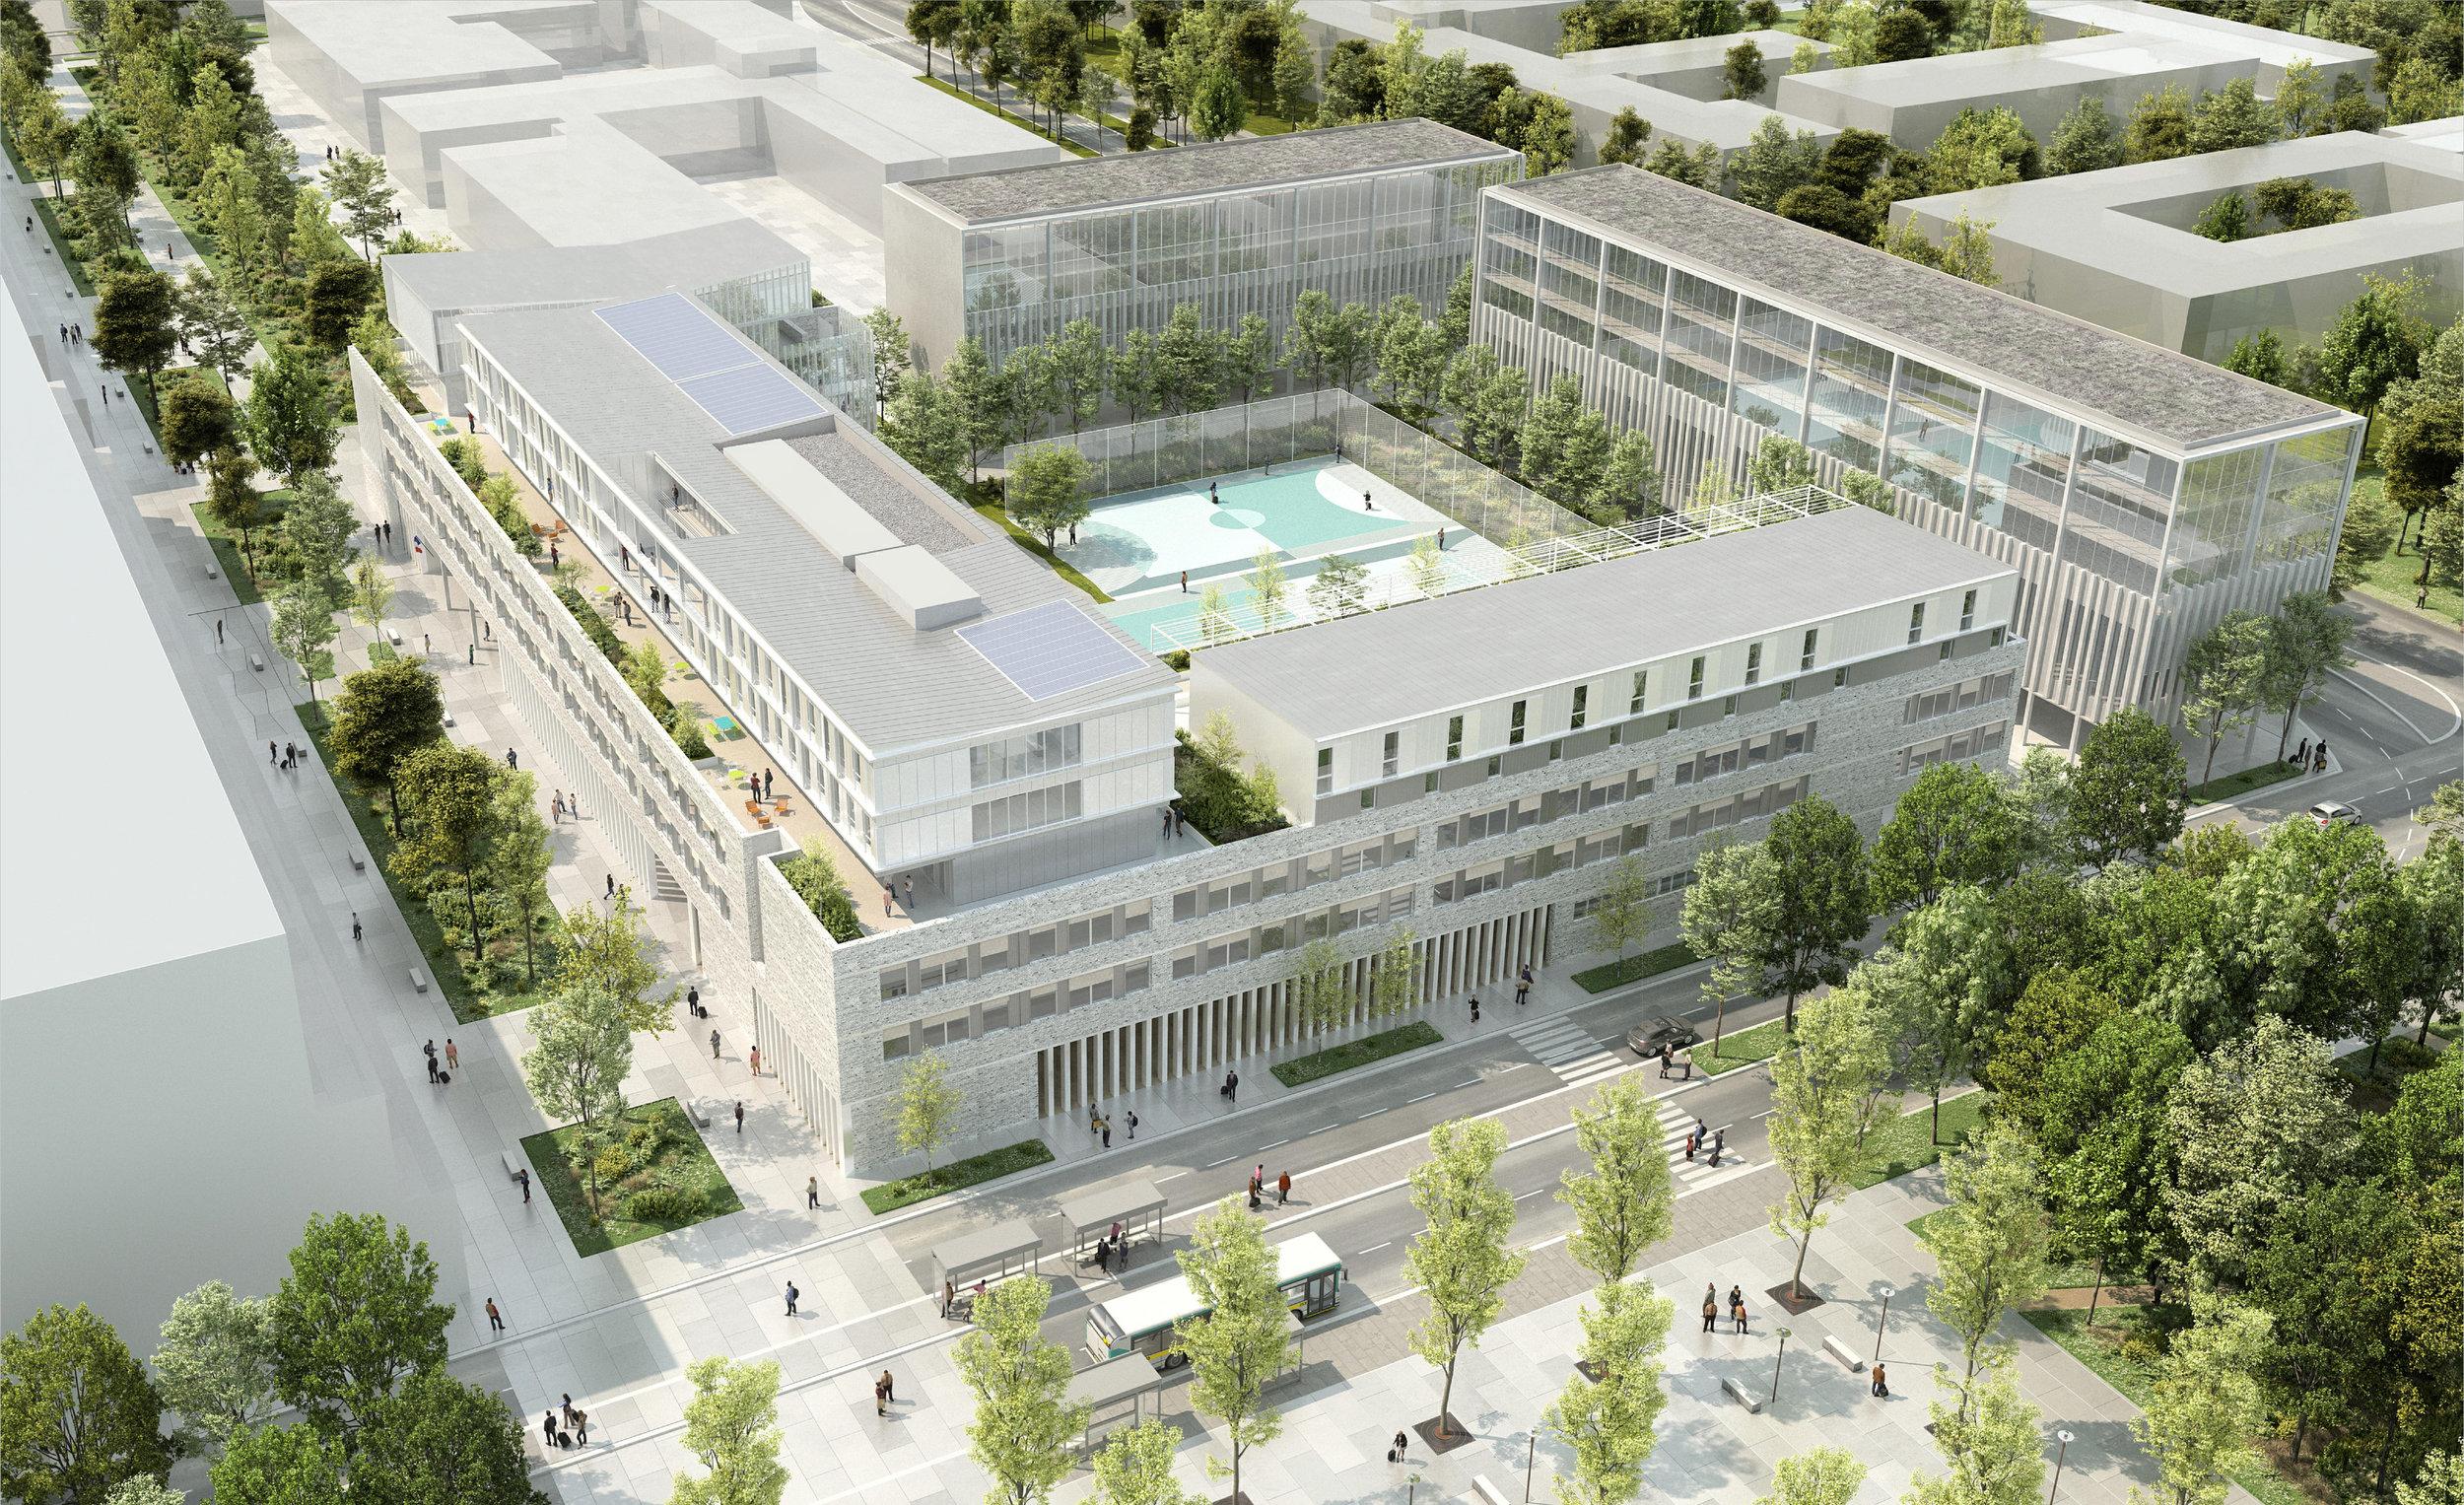 lycée_palaiseau_public_outdoor_design_christophe_gautrand_paysagiste_7.jpg